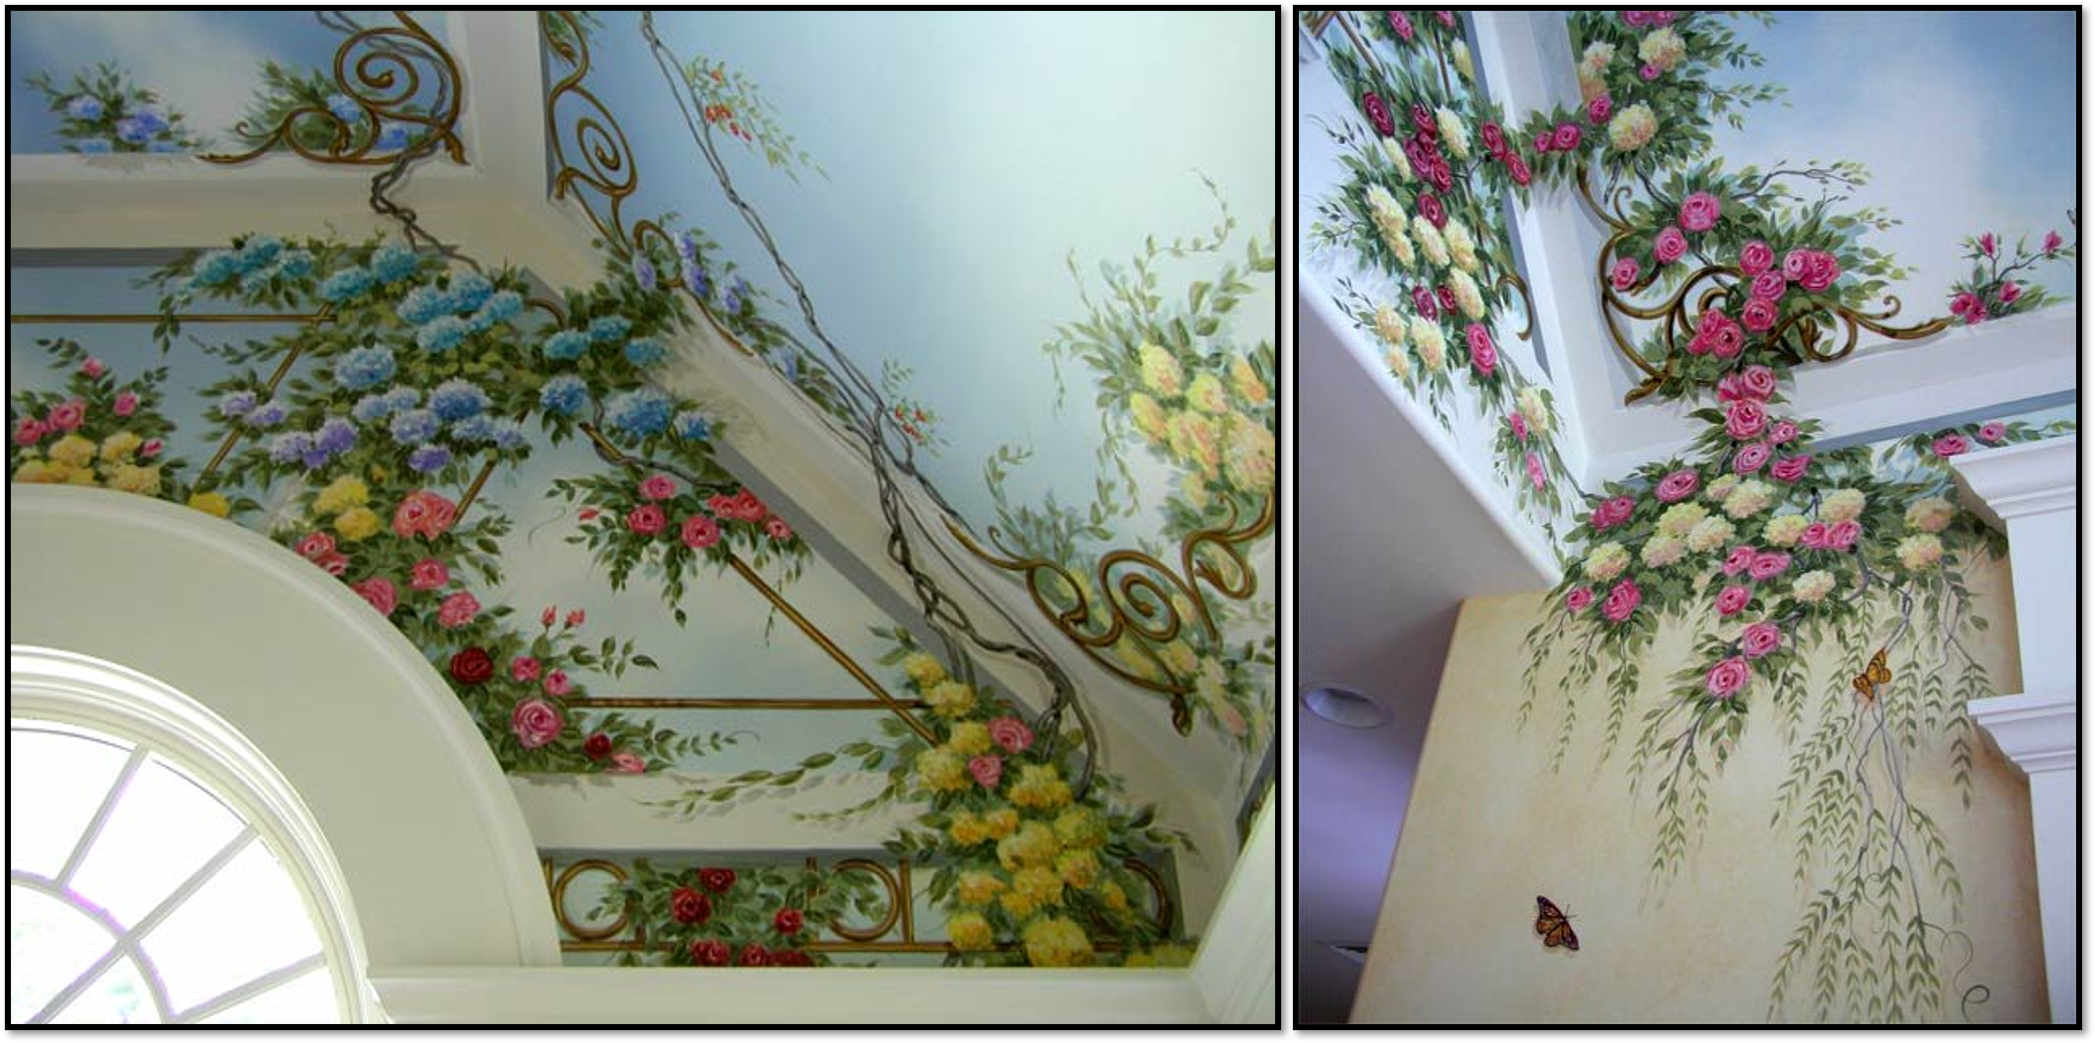 طرح گل گلی روی سقف